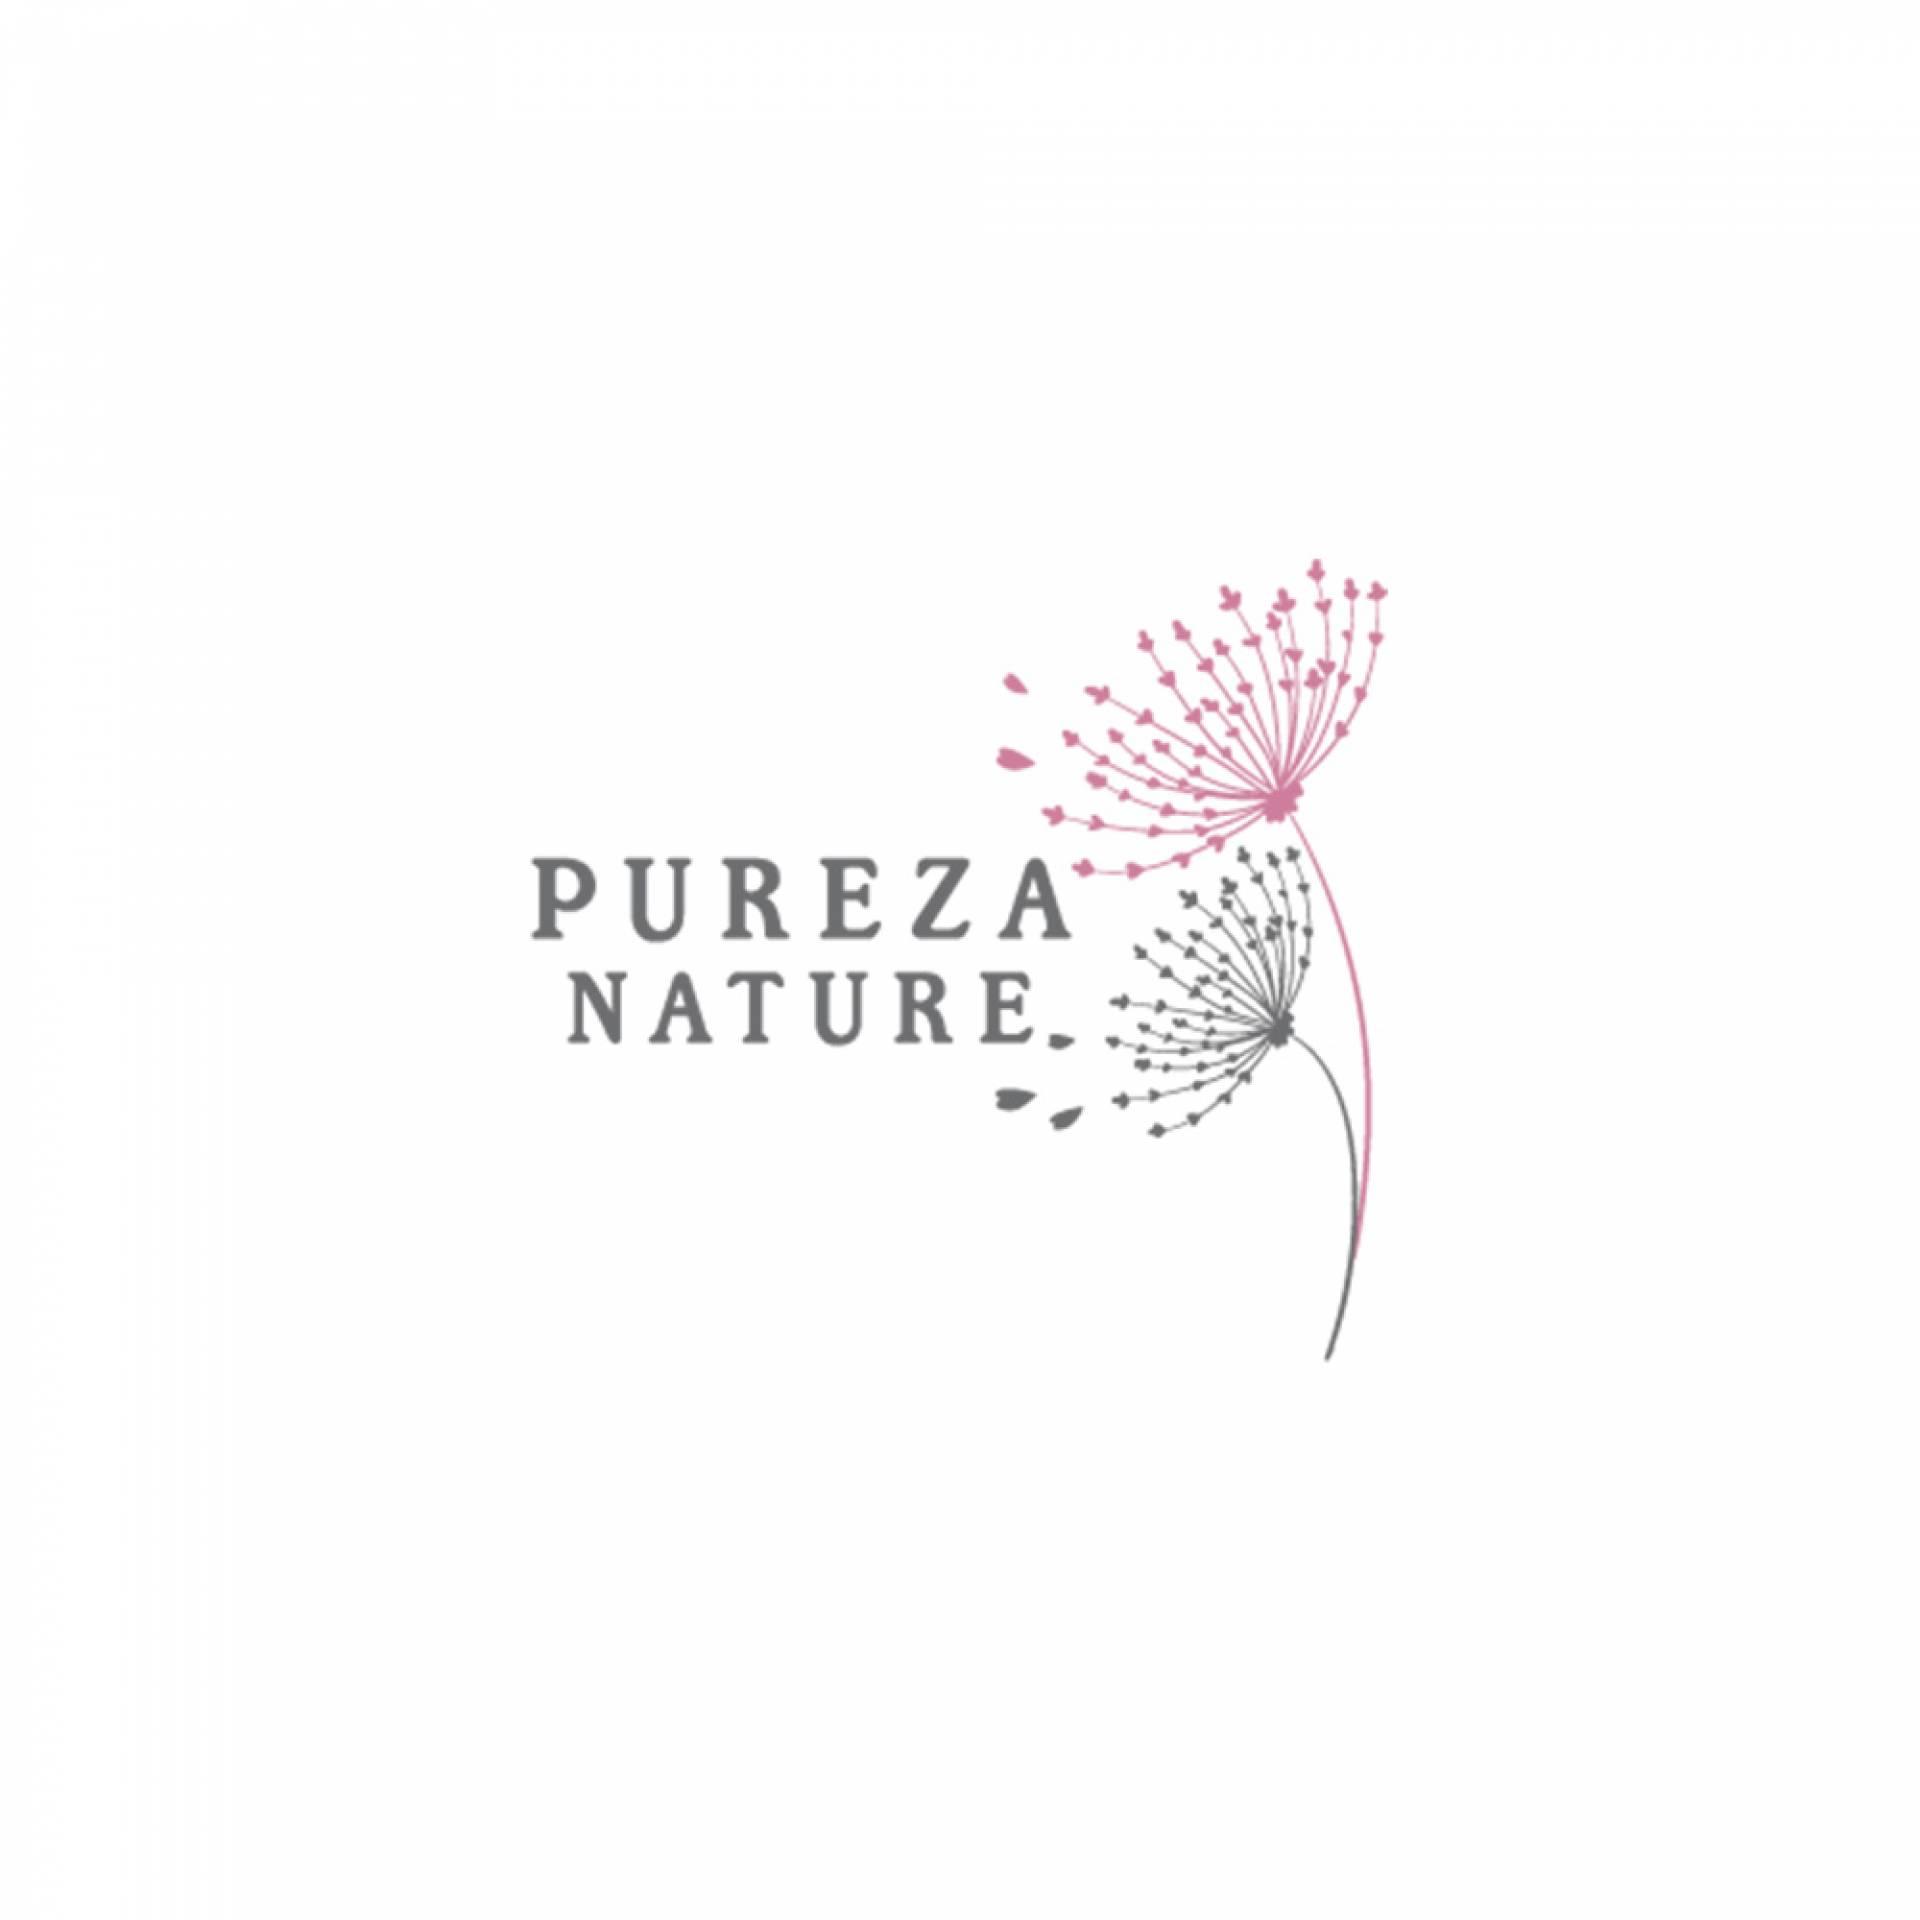 Pureza Nature